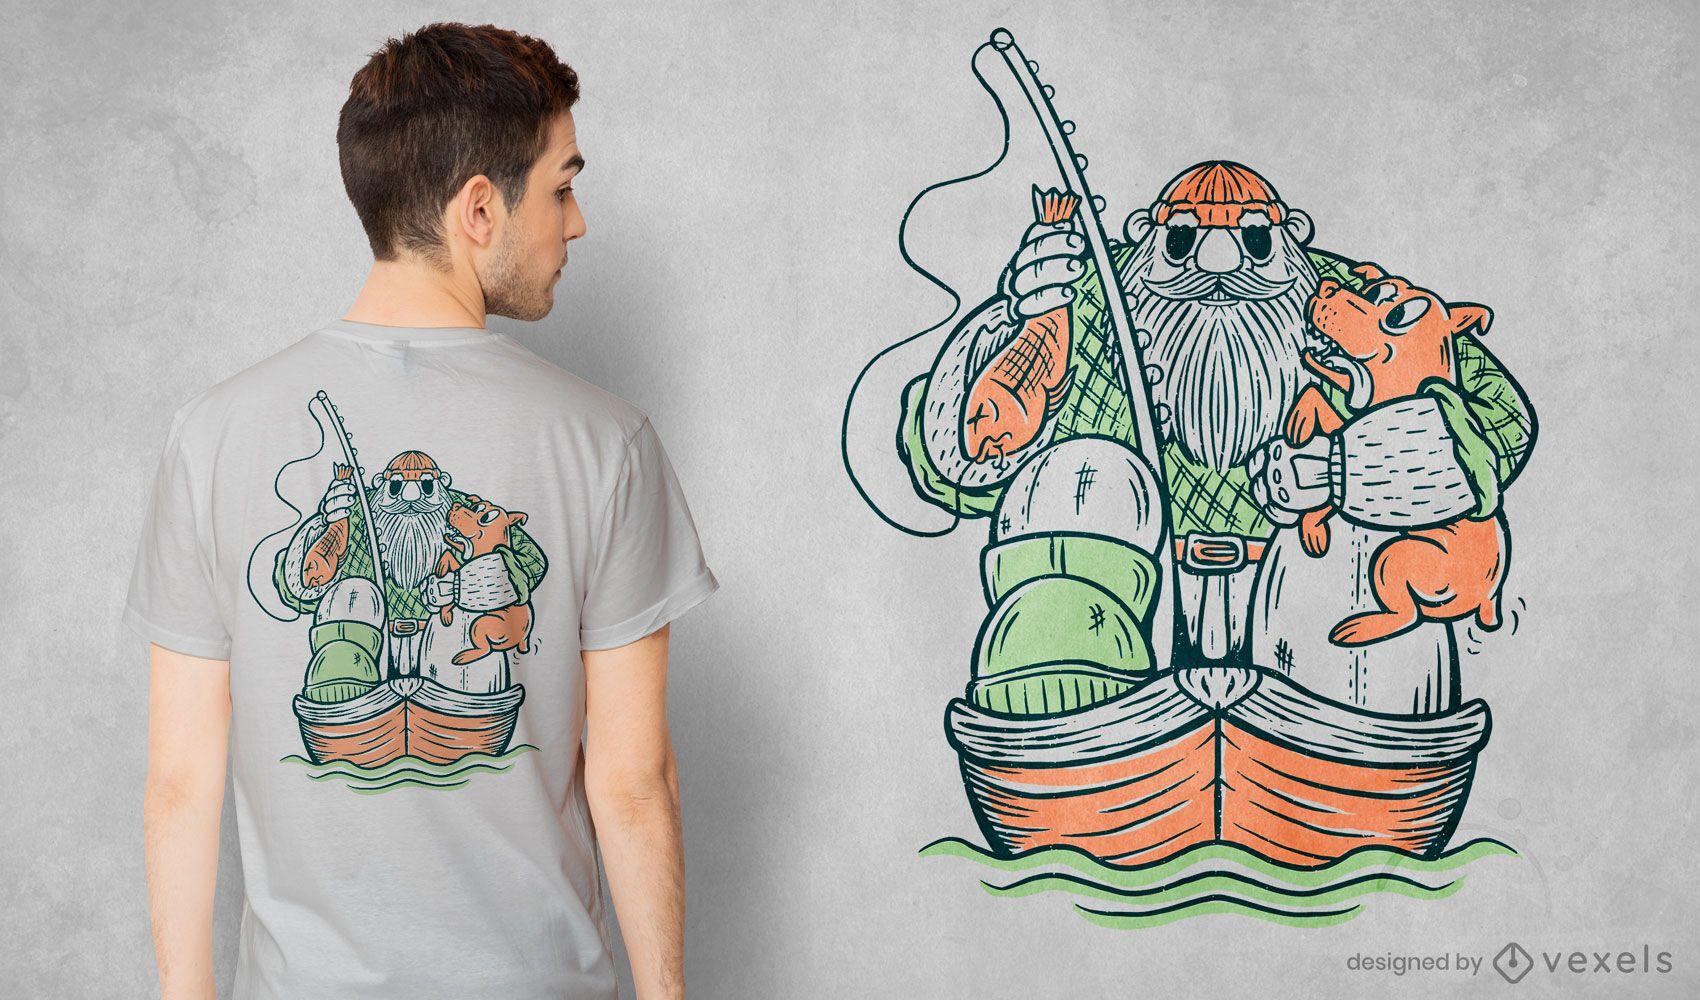 Fisherman and dog t-shirt design